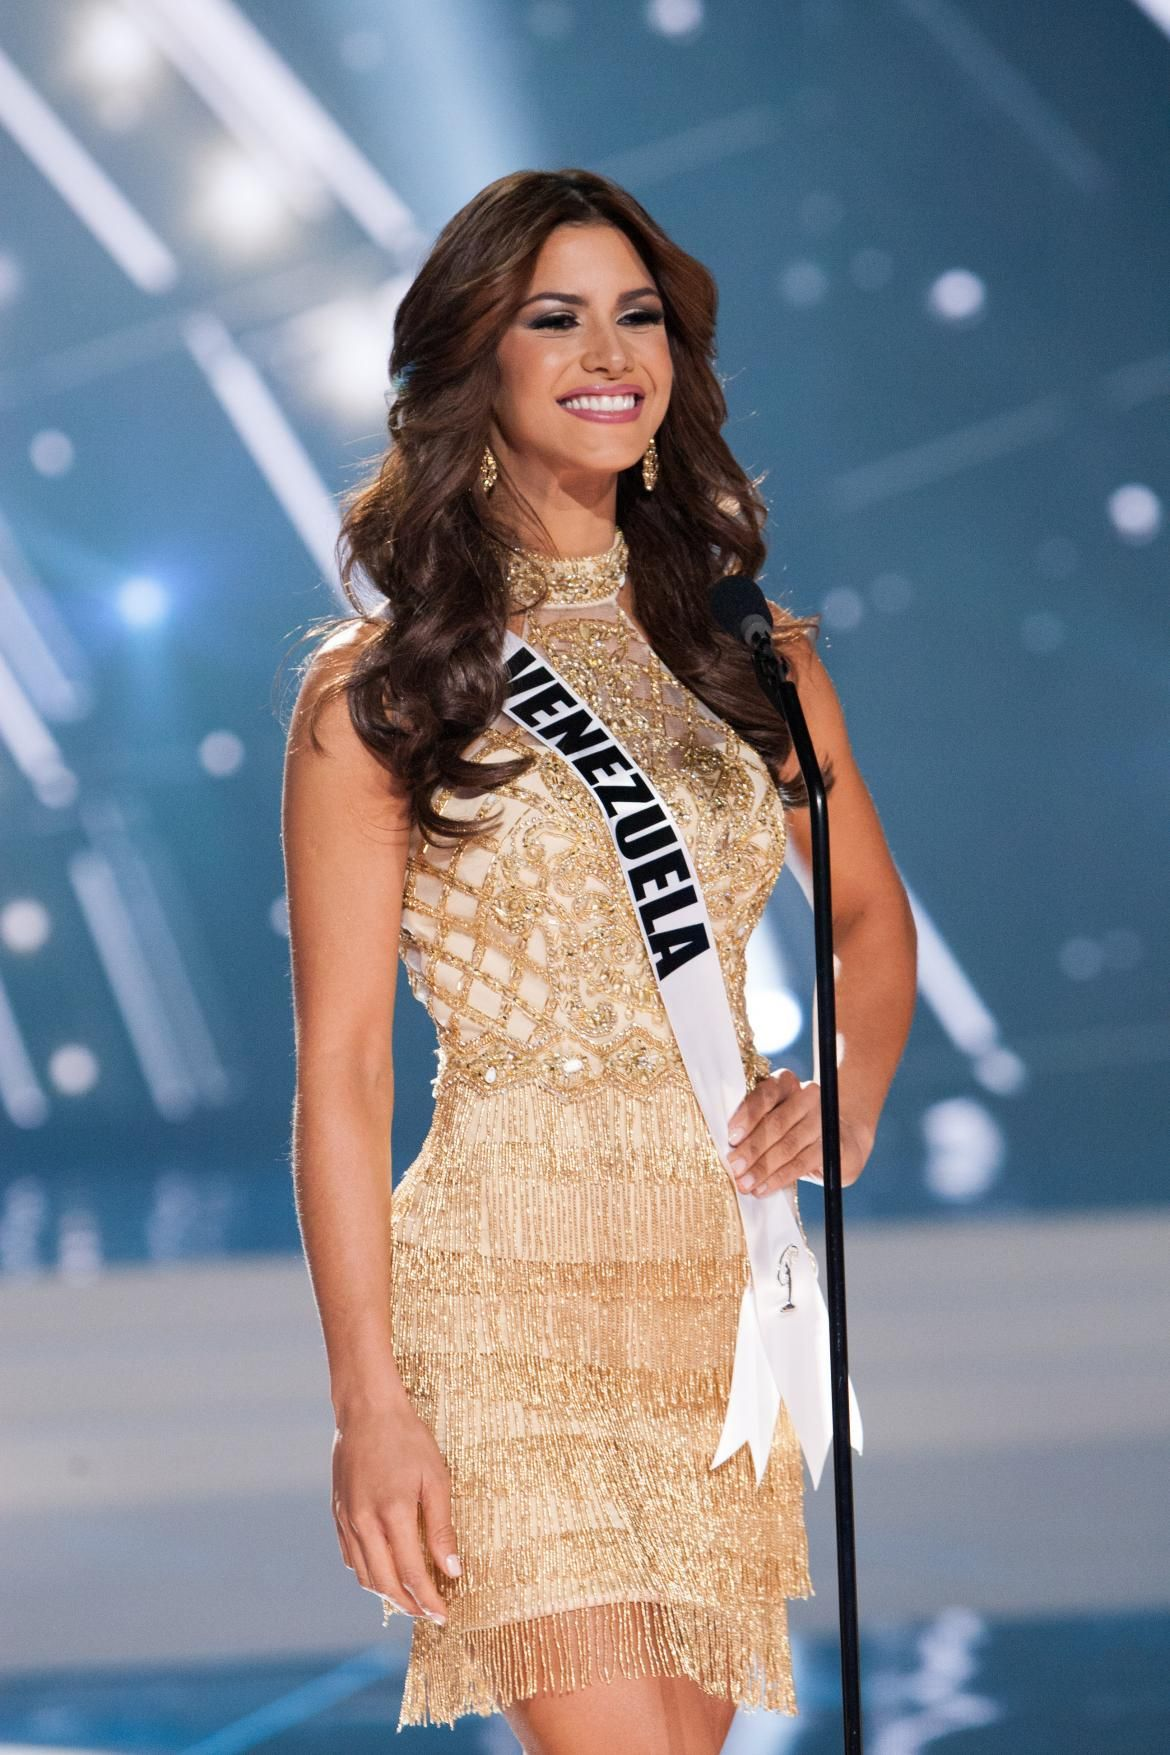 Mariana Jimenez Miss Universe 2015 Photos 5 Facts Of Beauty Queen Representing Venezuela Miss Universe 2015 Beauty Pageant Beauty Queens